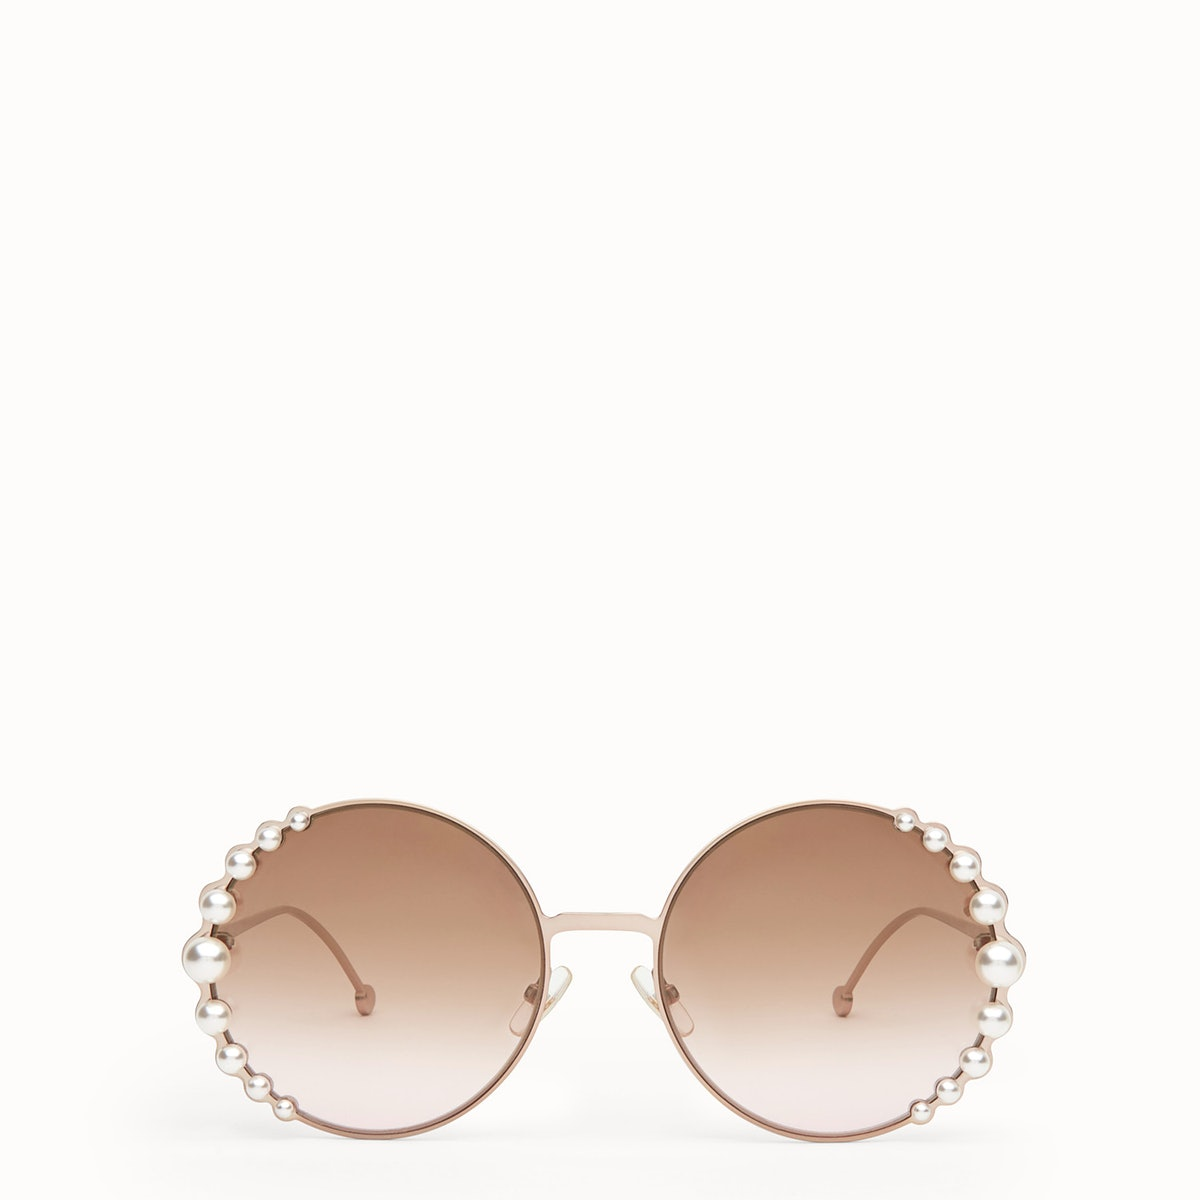 Ribbons & Pearls Metallic Sunglasses